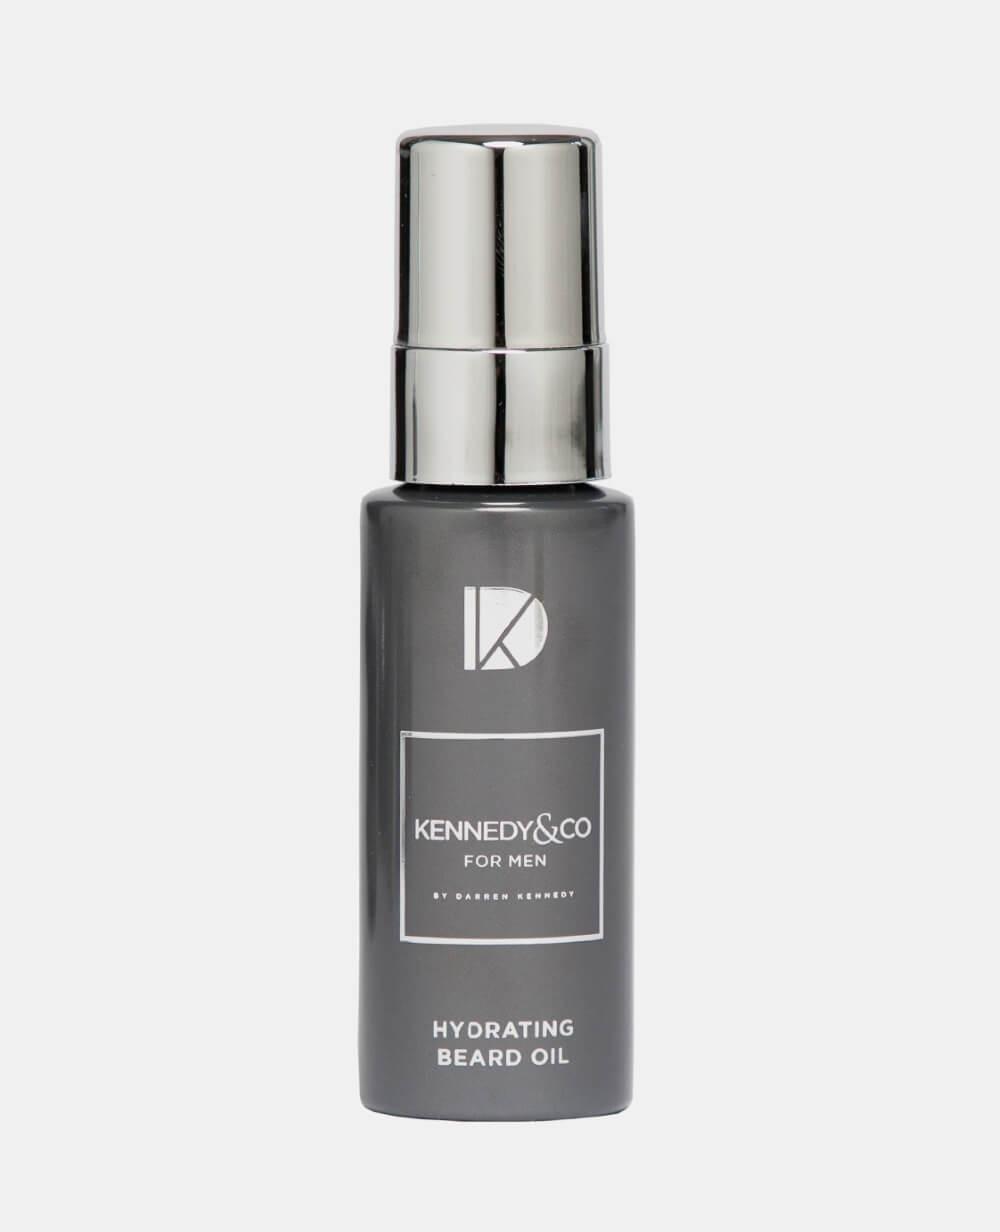 Kennedy & Co Hydrating Beard Oil 50ml